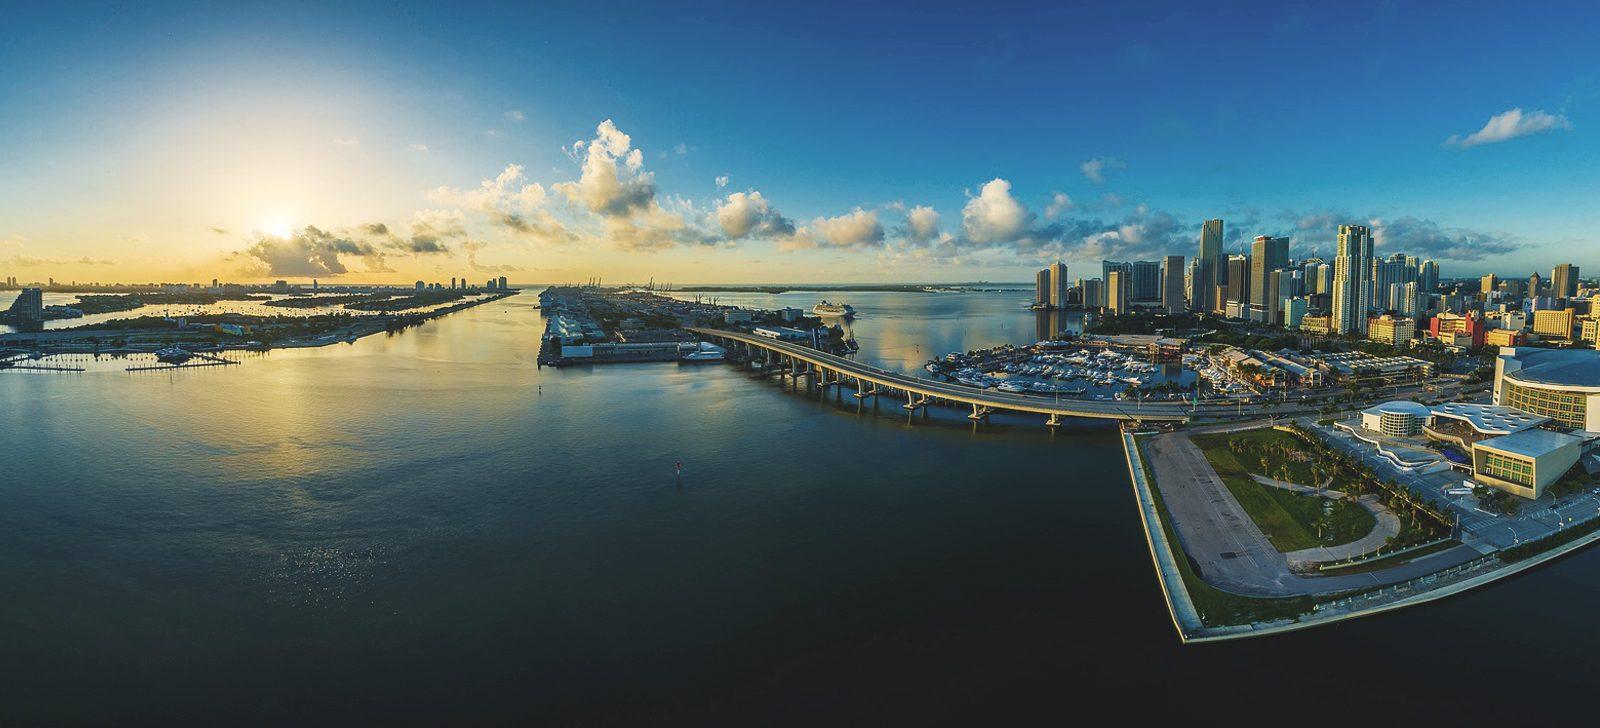 Spot on Travel Florida